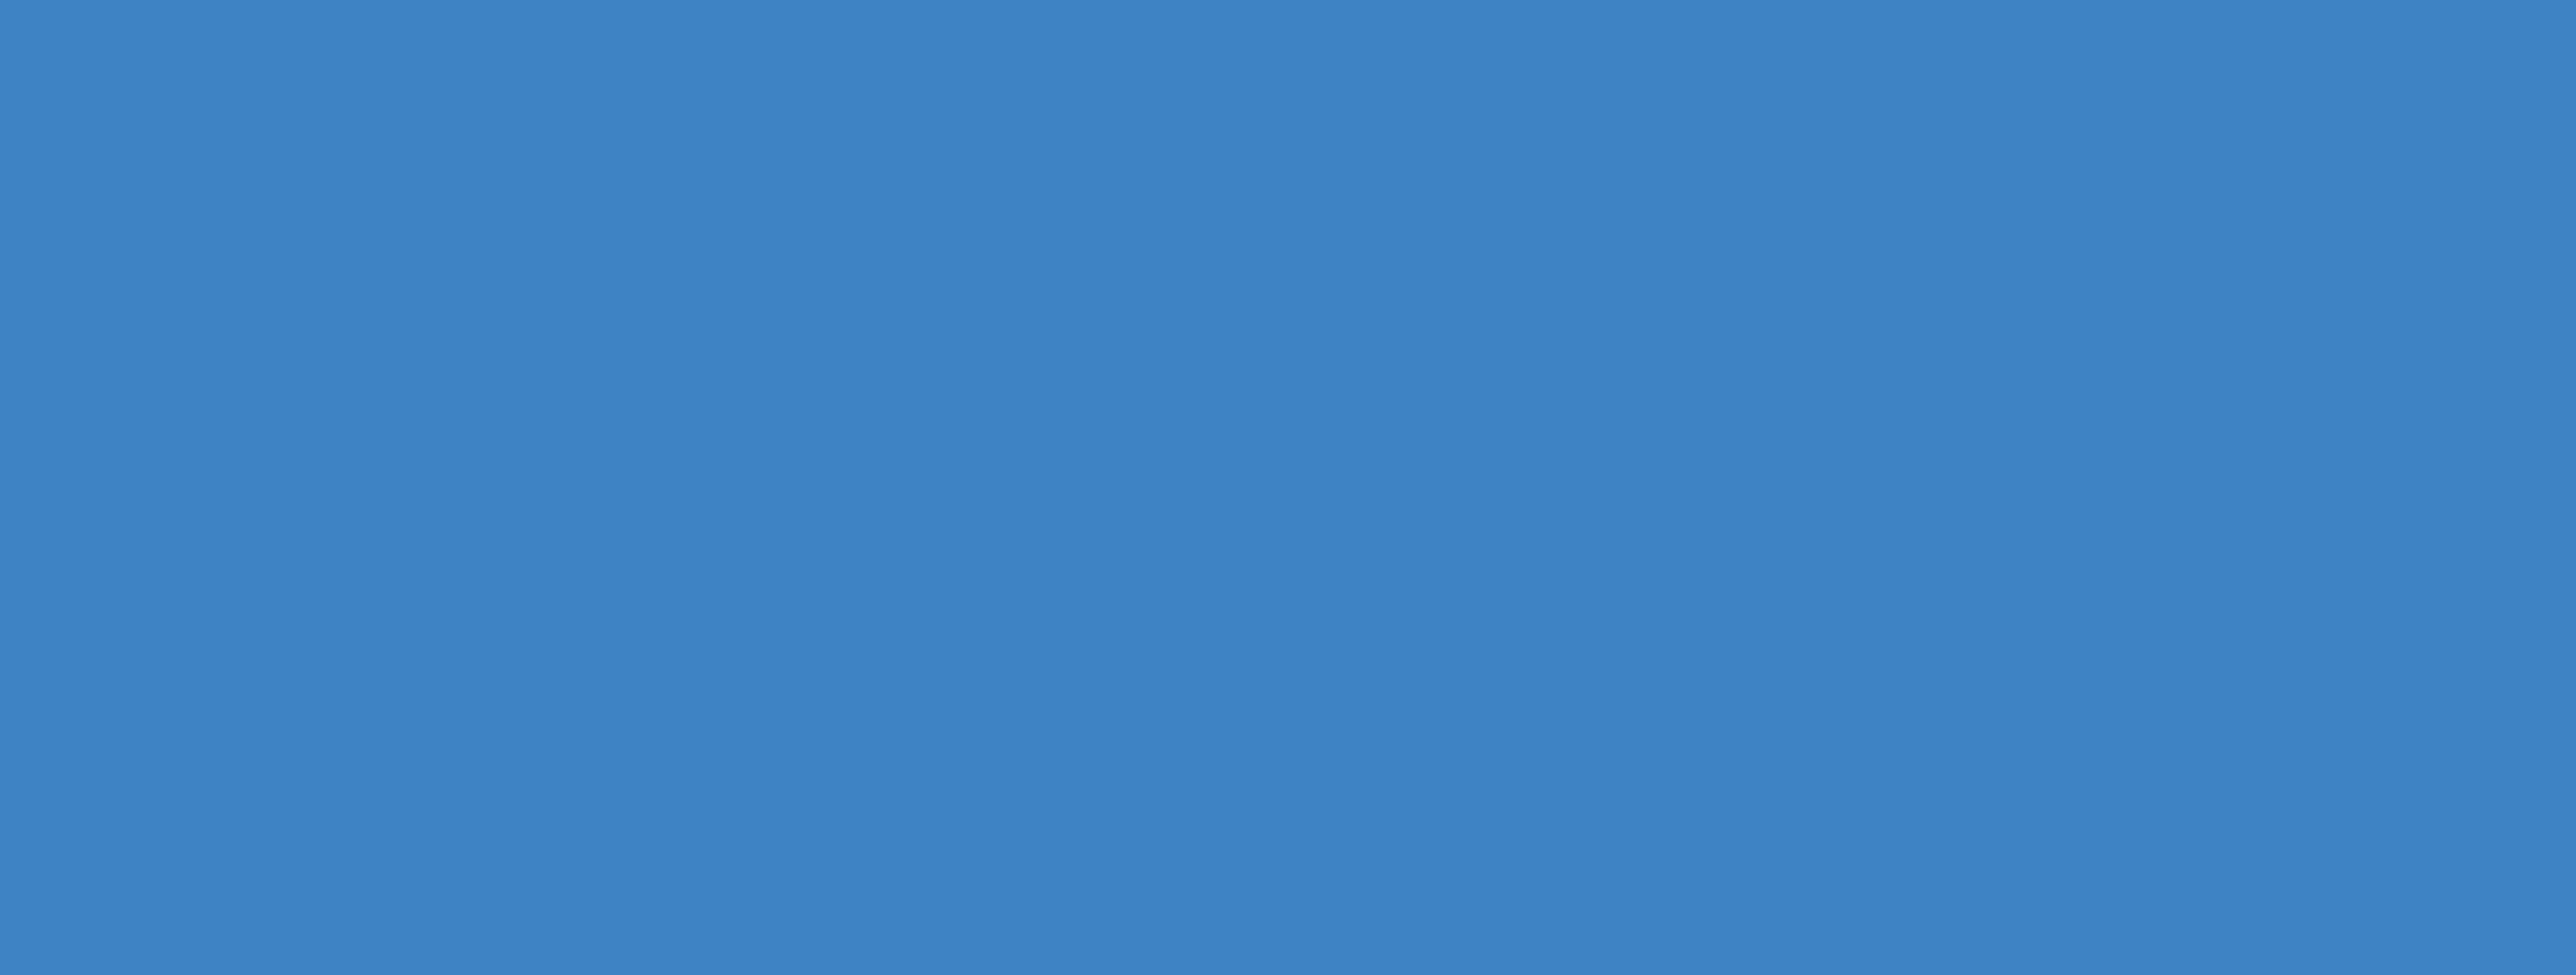 azul-fondo